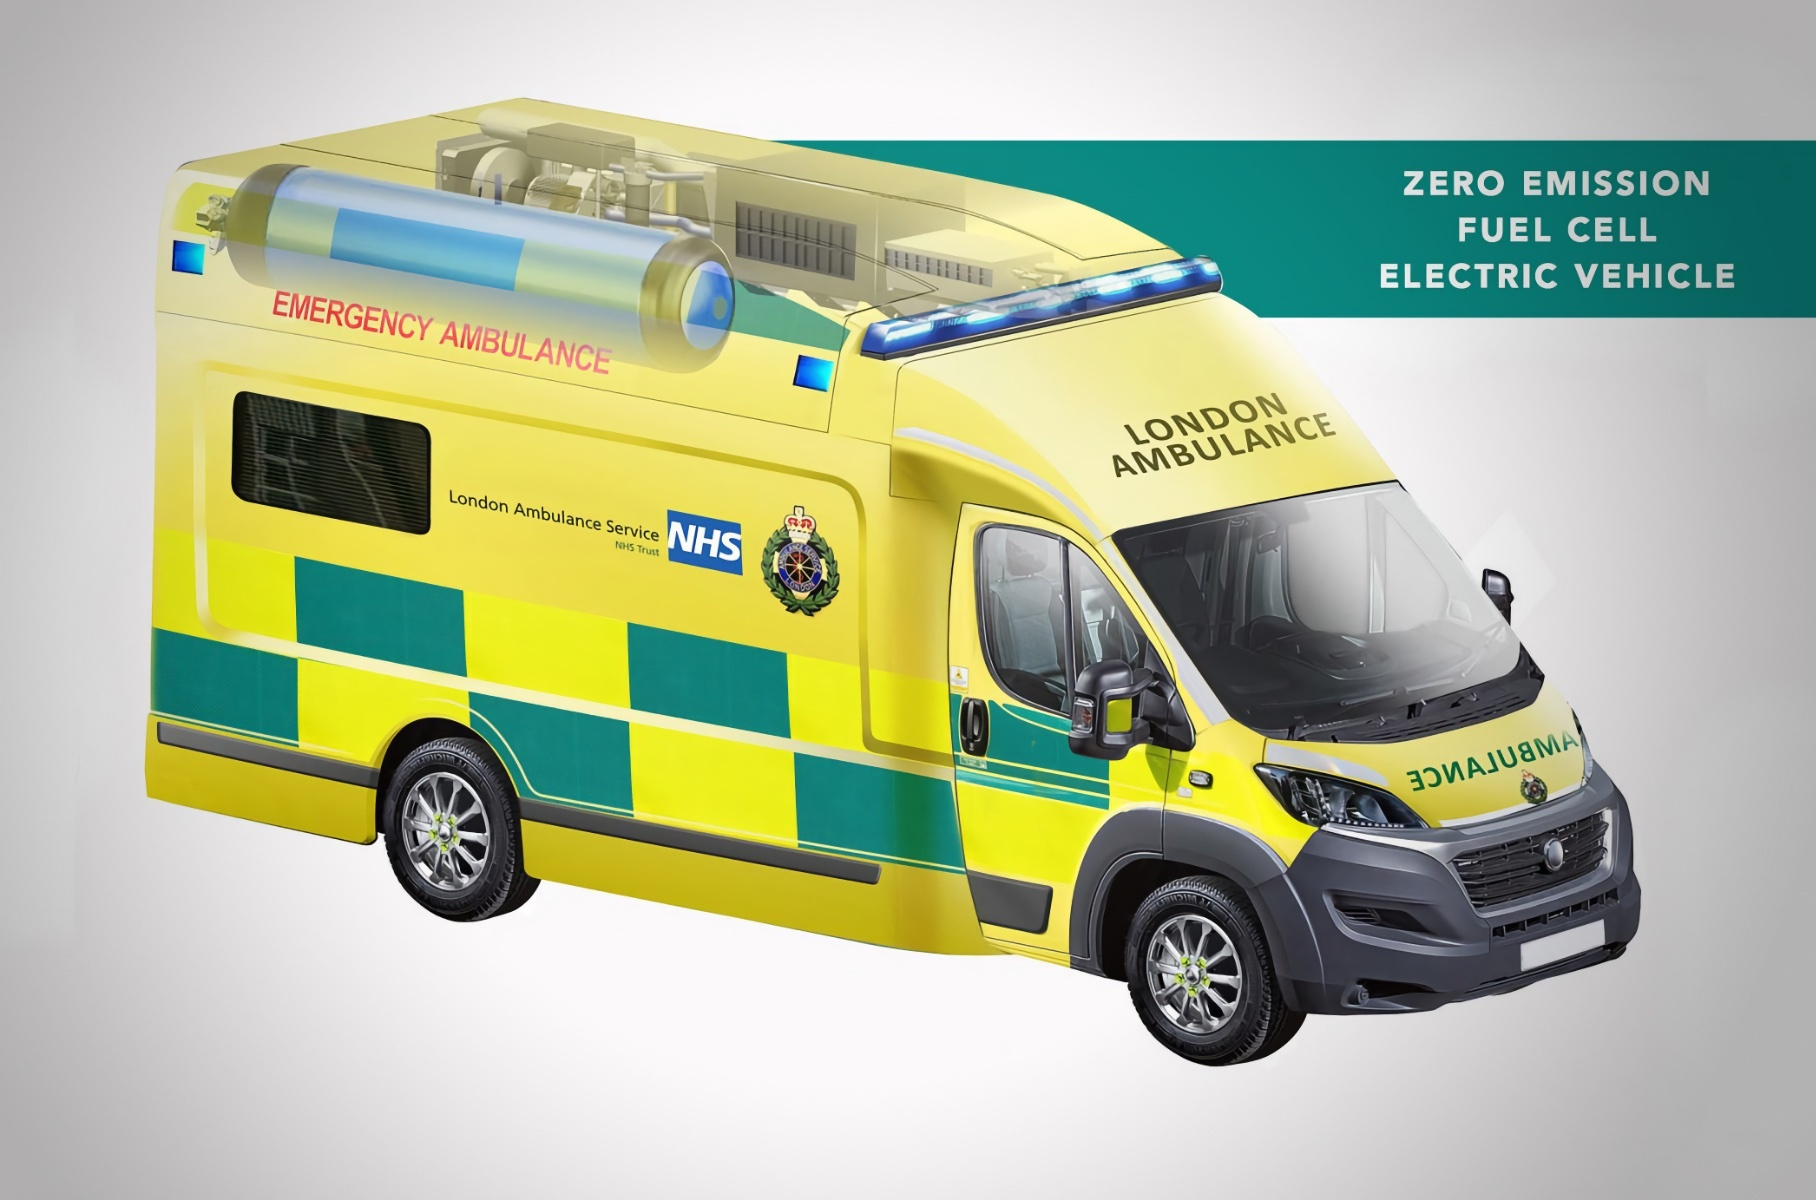 Представлена машина скорой помощи на водороде